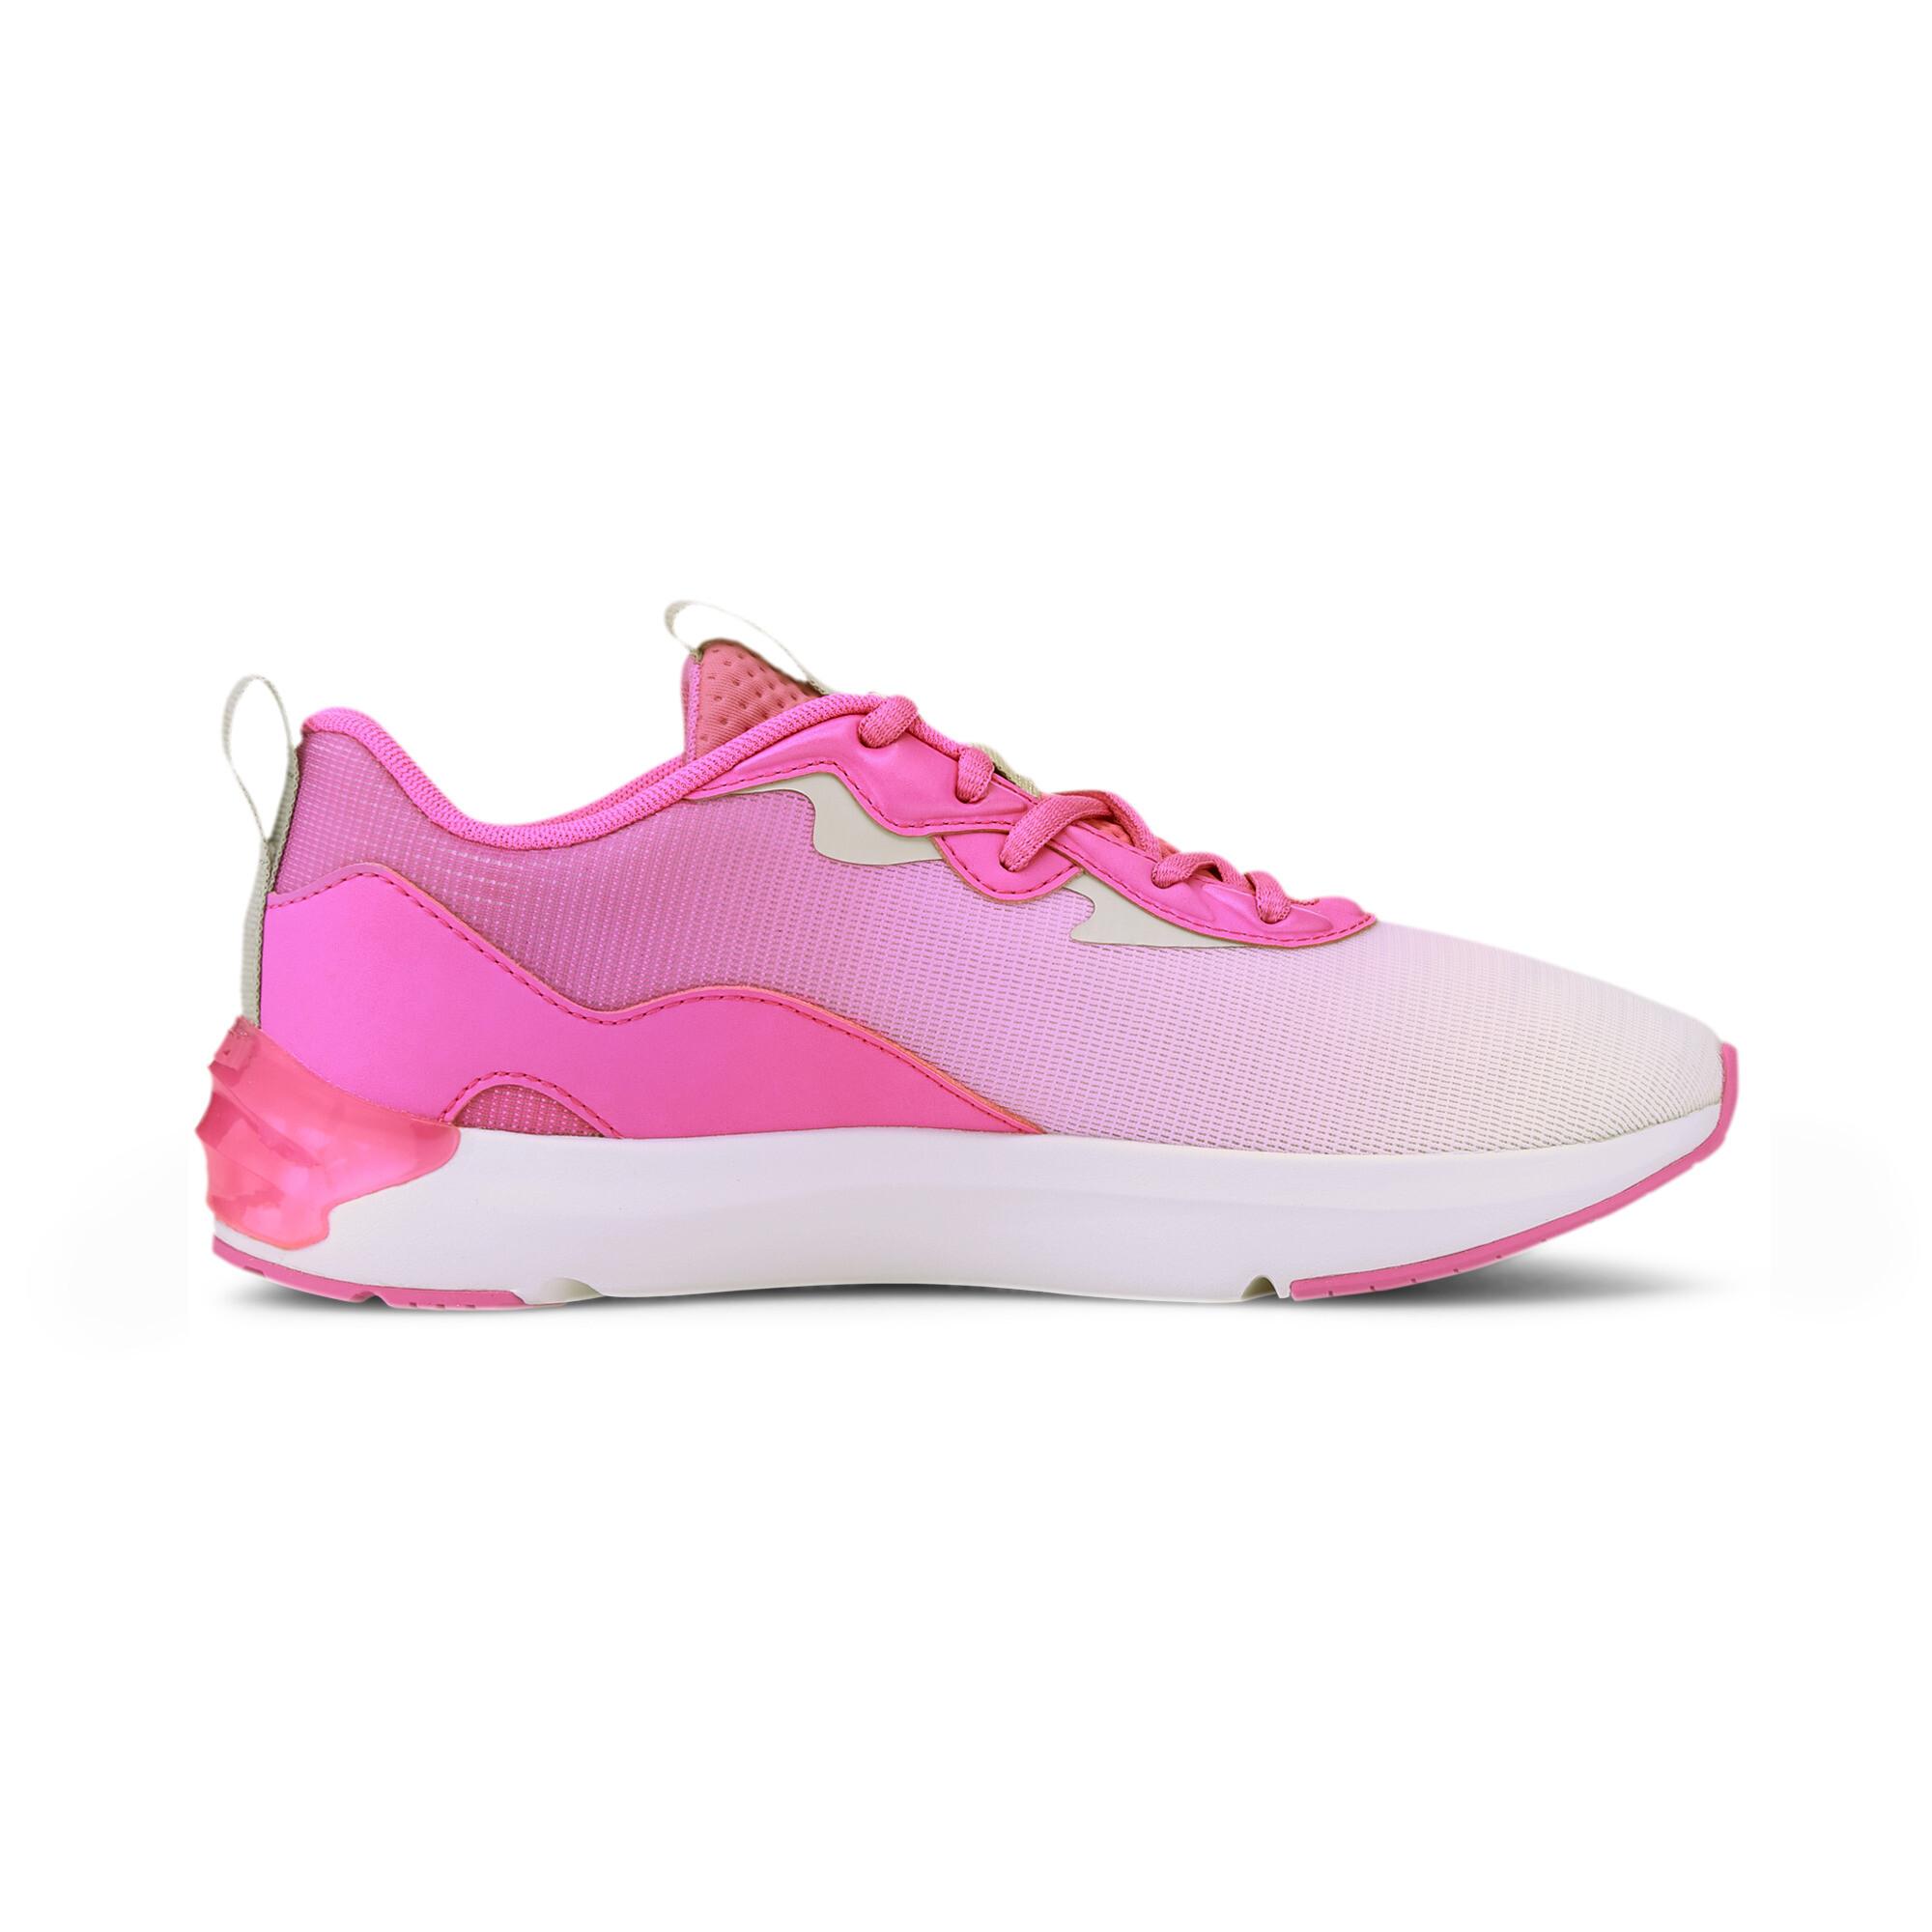 PUMA-Women-039-s-CELL-Initiate-Fade-Training-Shoes thumbnail 7